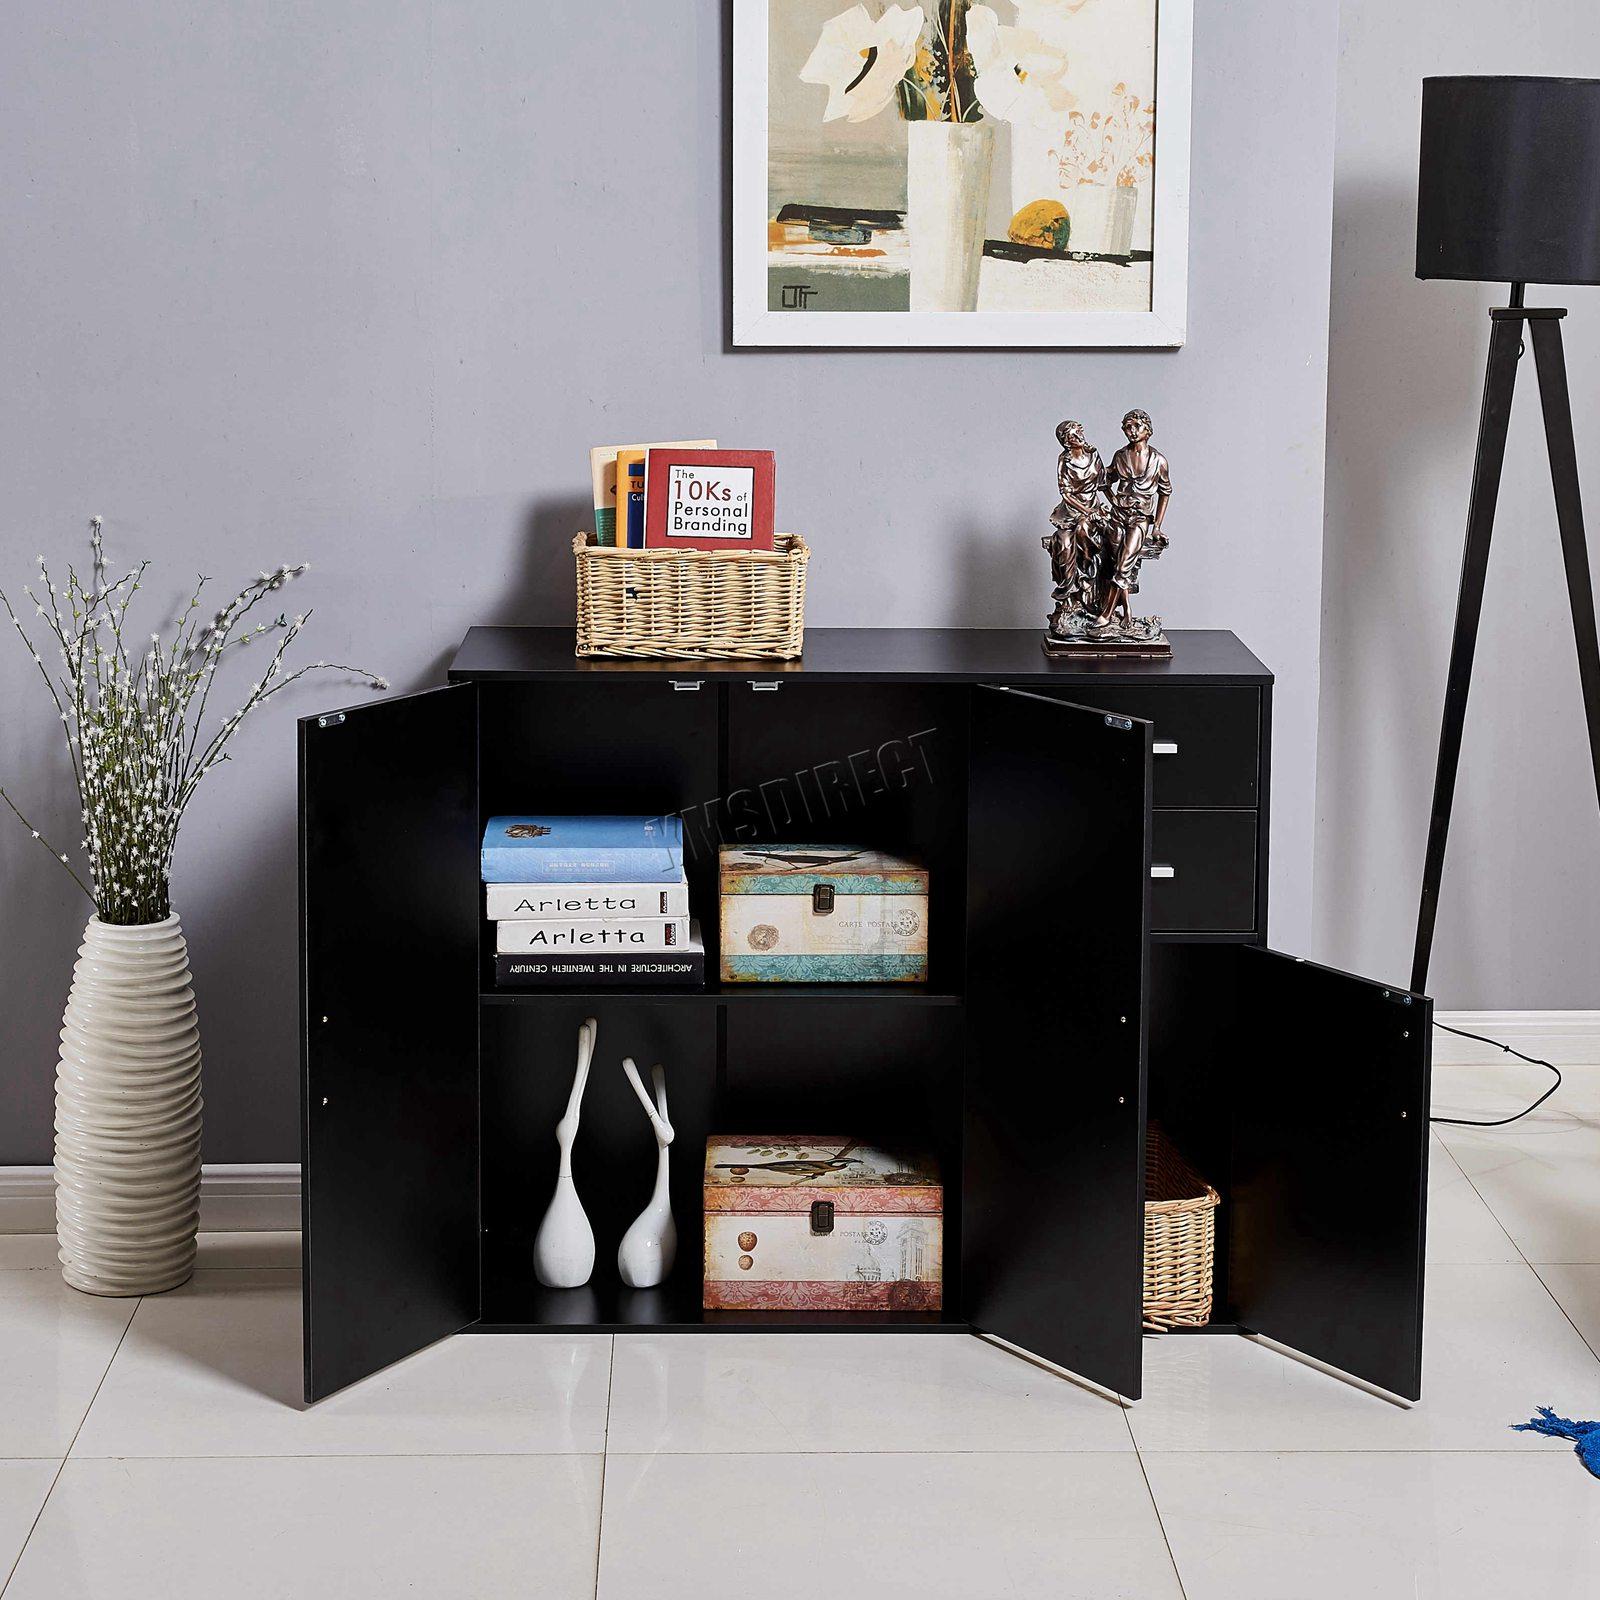 WestWood-Sideboard-Cabinet-Storage-tableware-Kitchen-Cupboard-Unit-PB-SSP01-NEW thumbnail 27